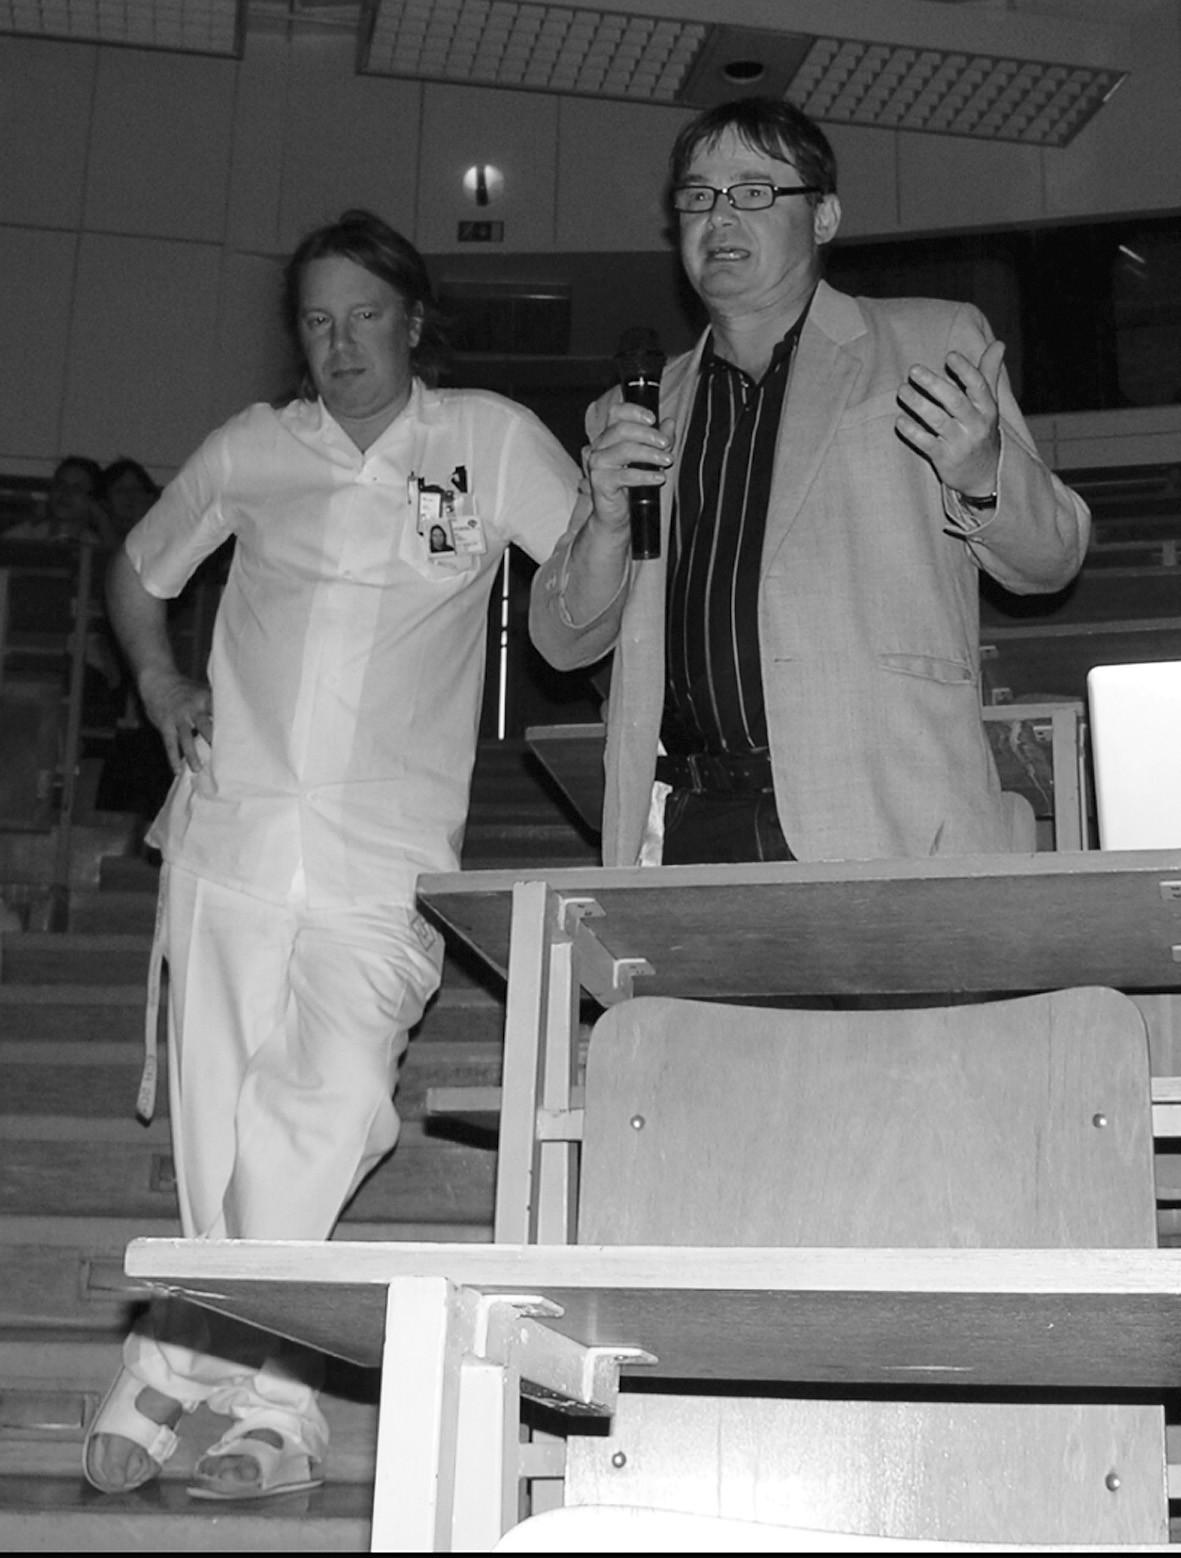 Diskuze – prof. MUDr. Pavel Eliáš, CSc. (vpravo)